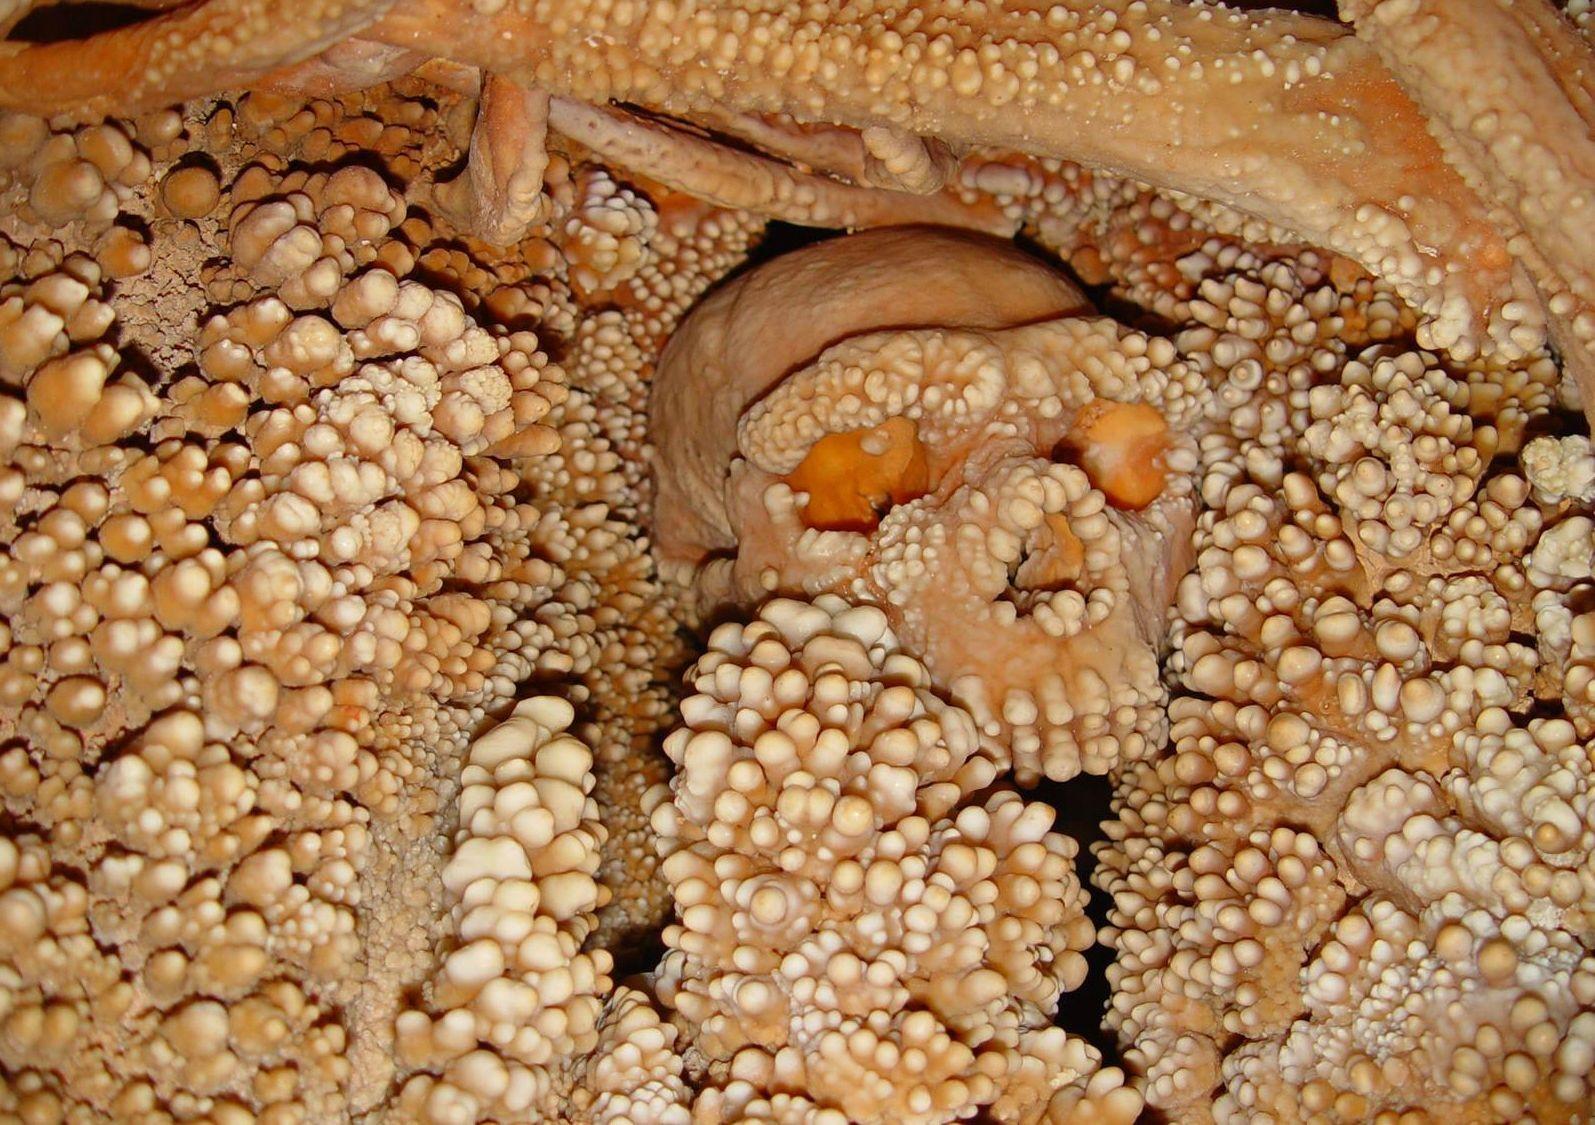 italya mağara 187,000 yıllık neanderthal